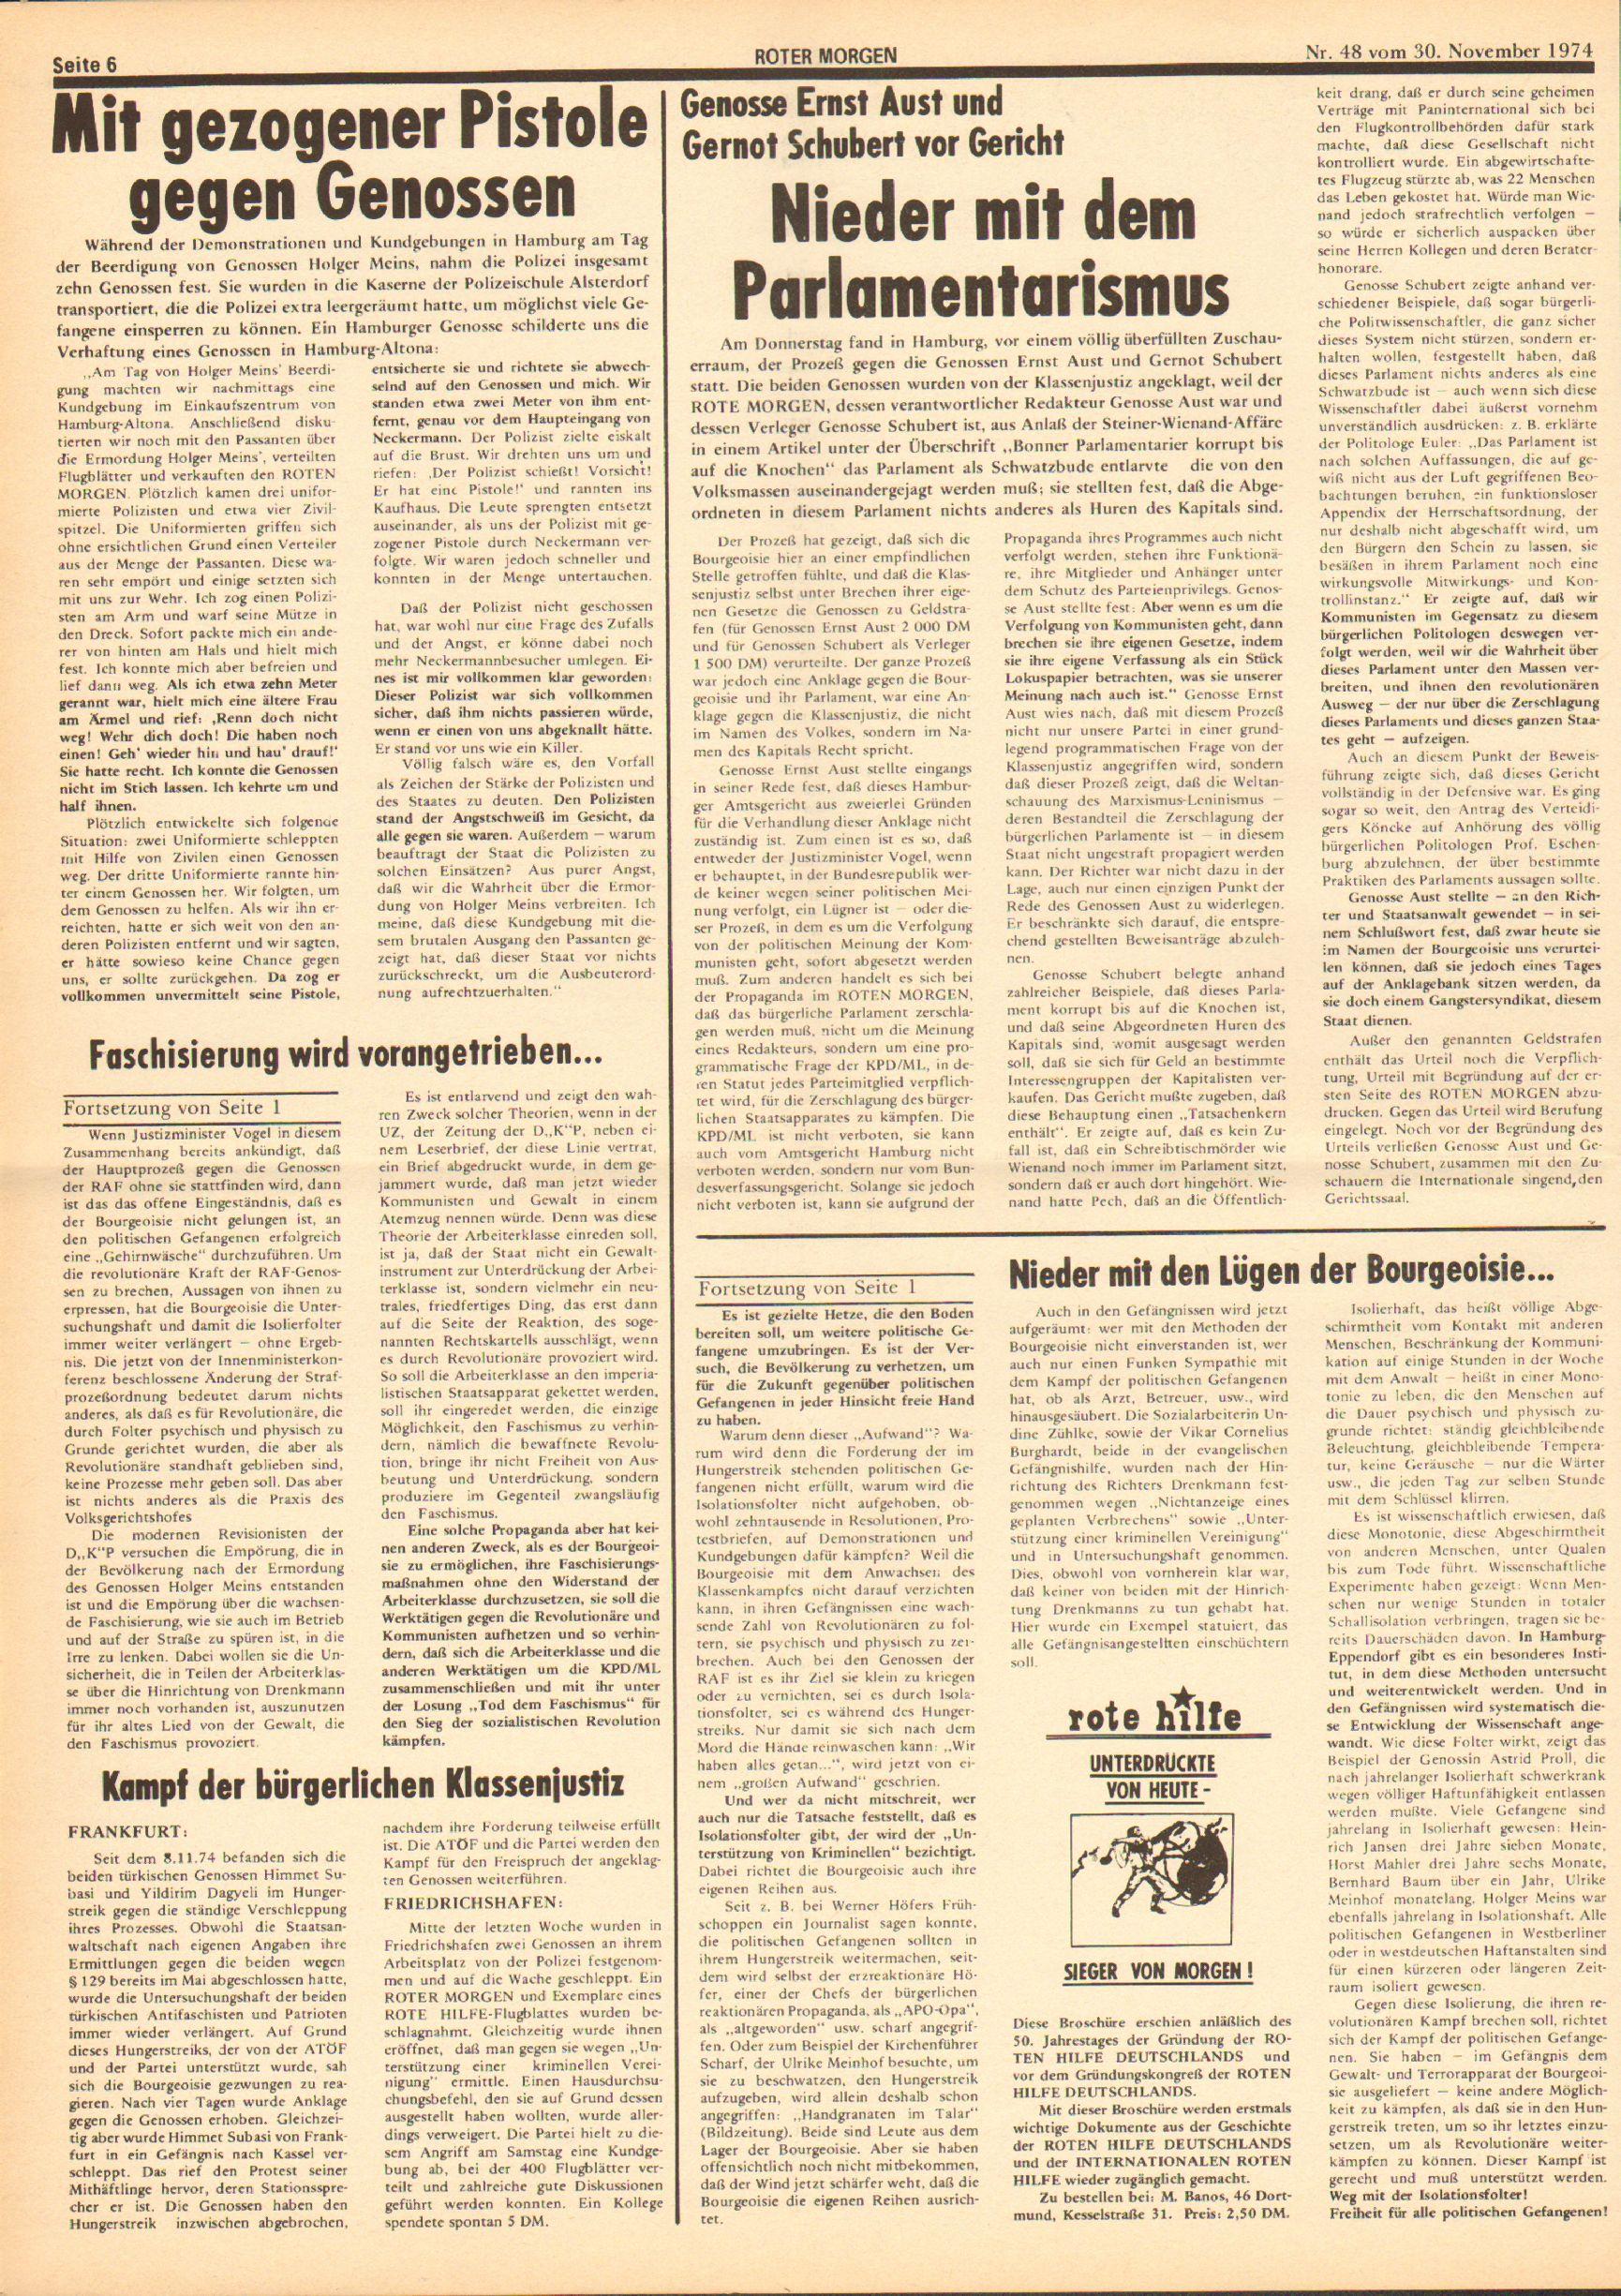 Roter Morgen, 8. Jg., 30. November 1974, Nr. 48, Seite 6